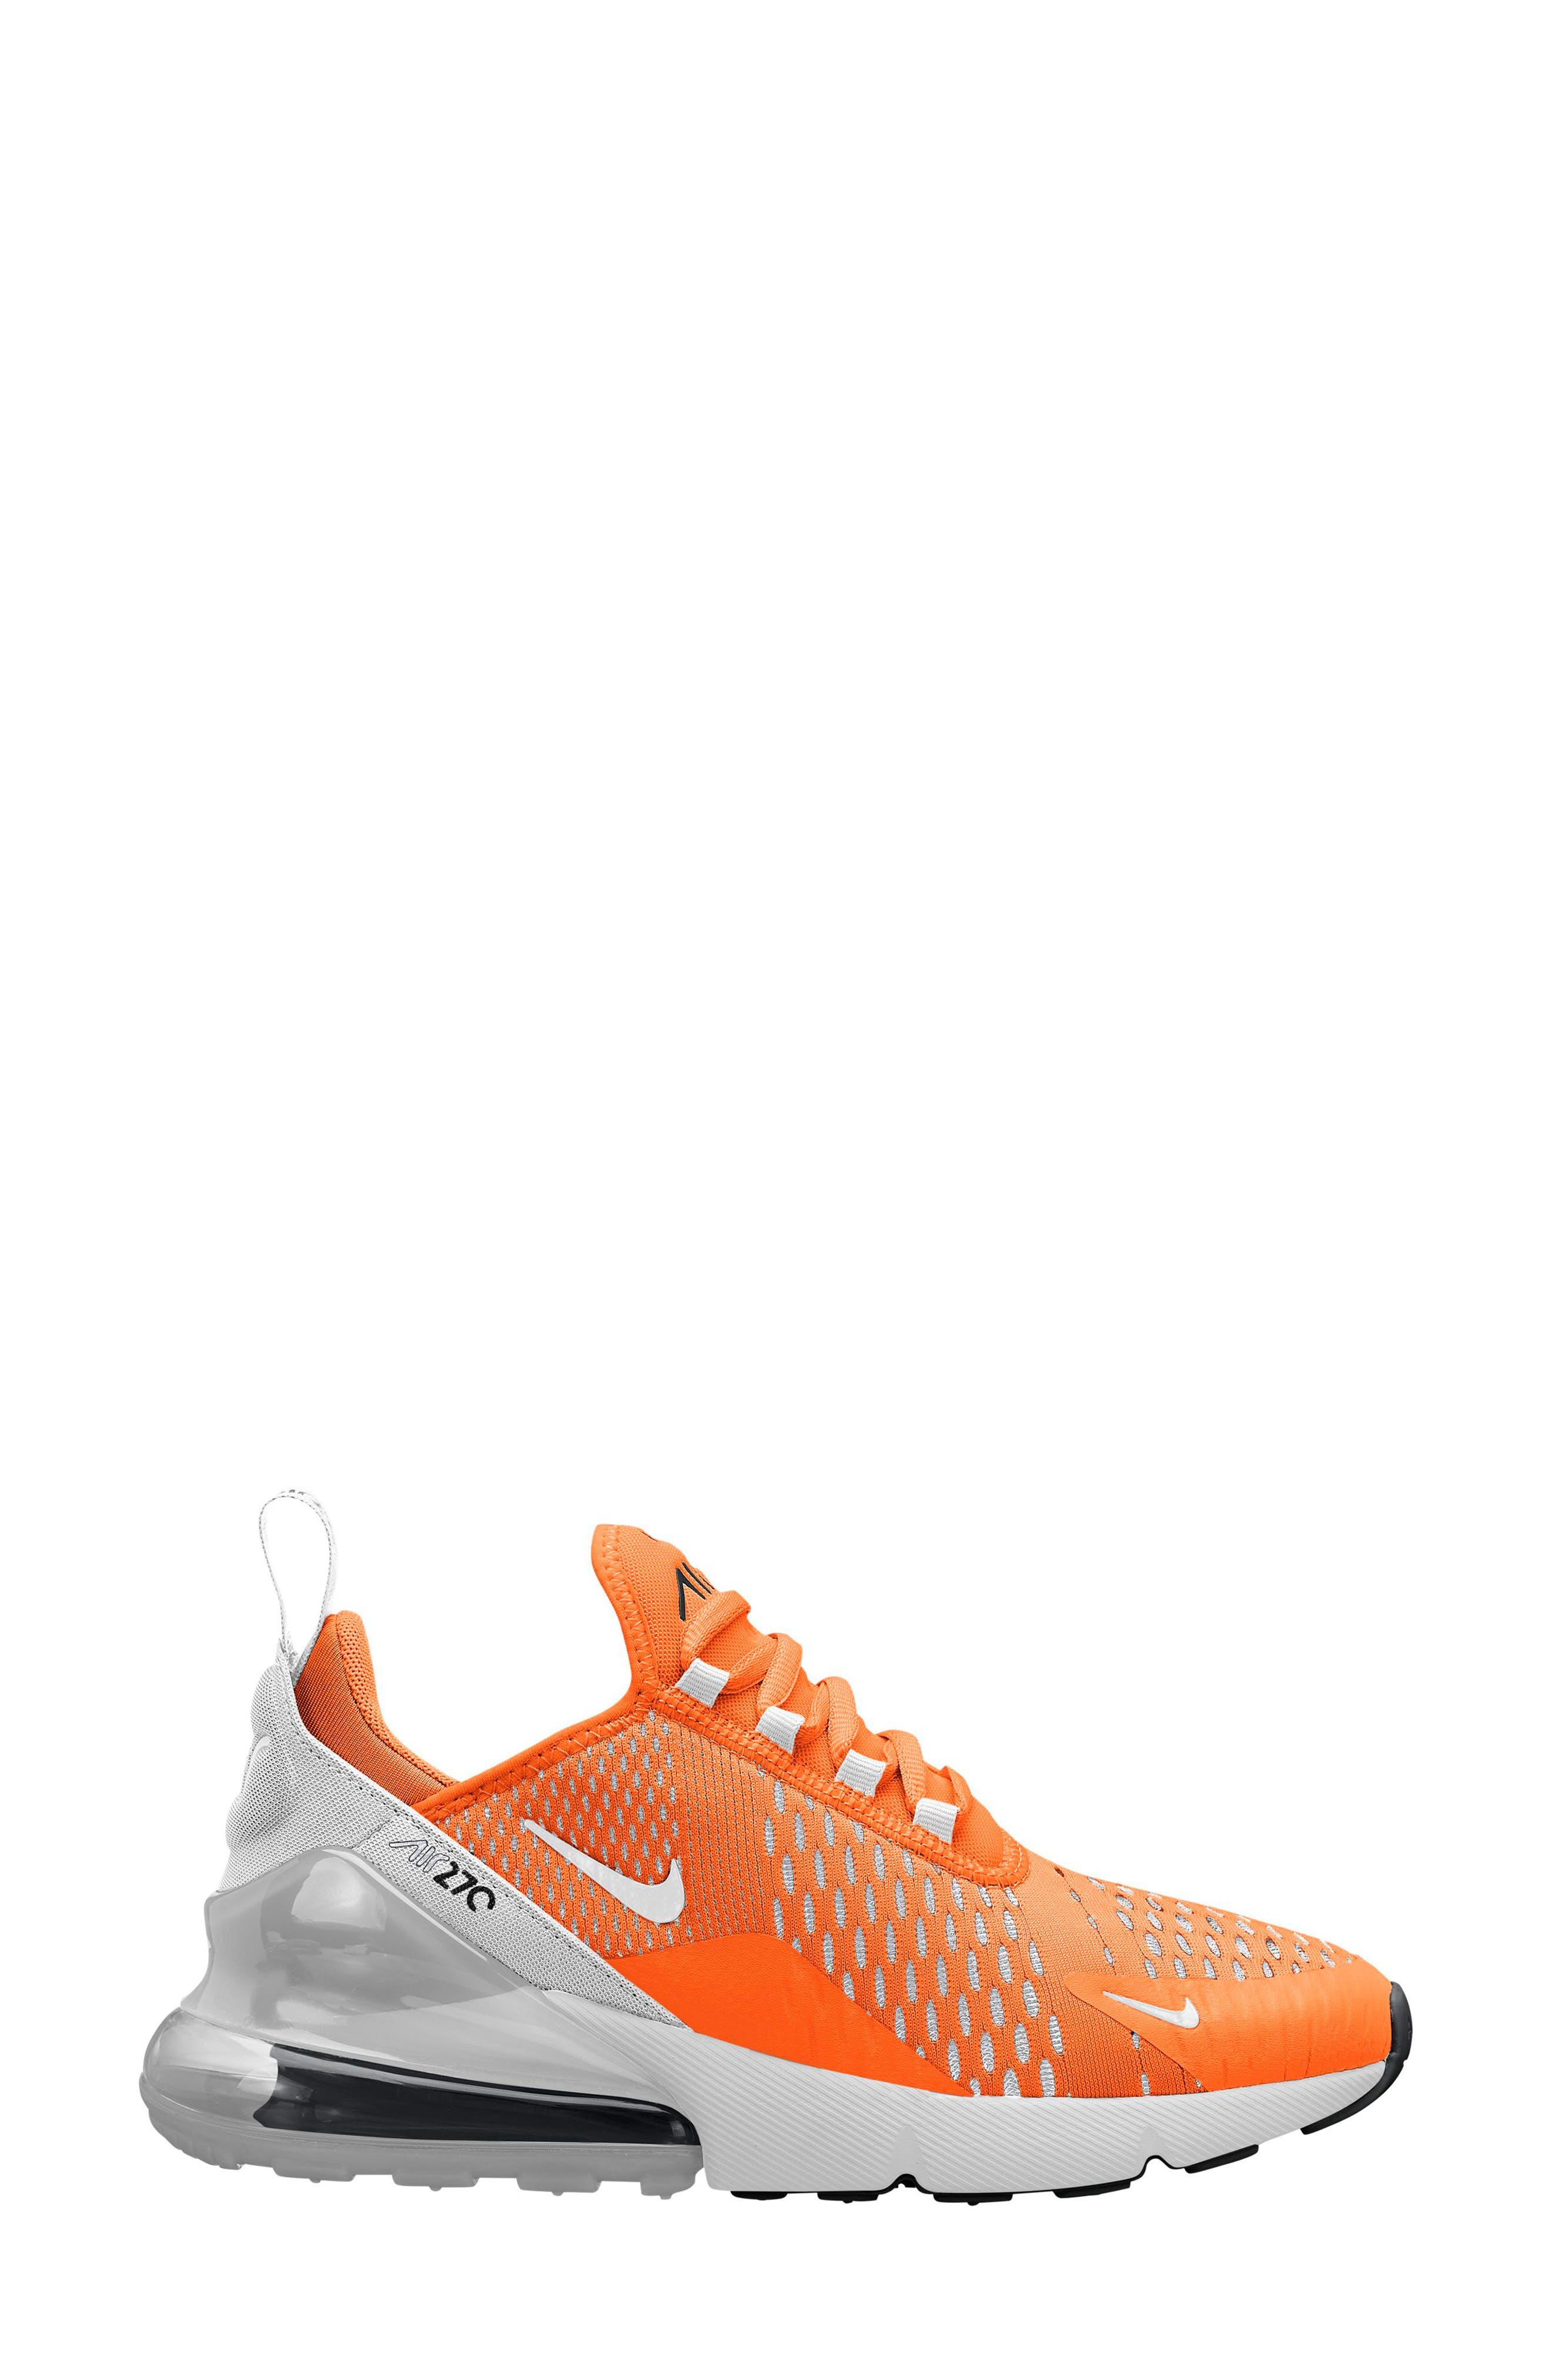 Air Max 270 Sneaker,                             Main thumbnail 1, color,                             Total Orange/ White-Black